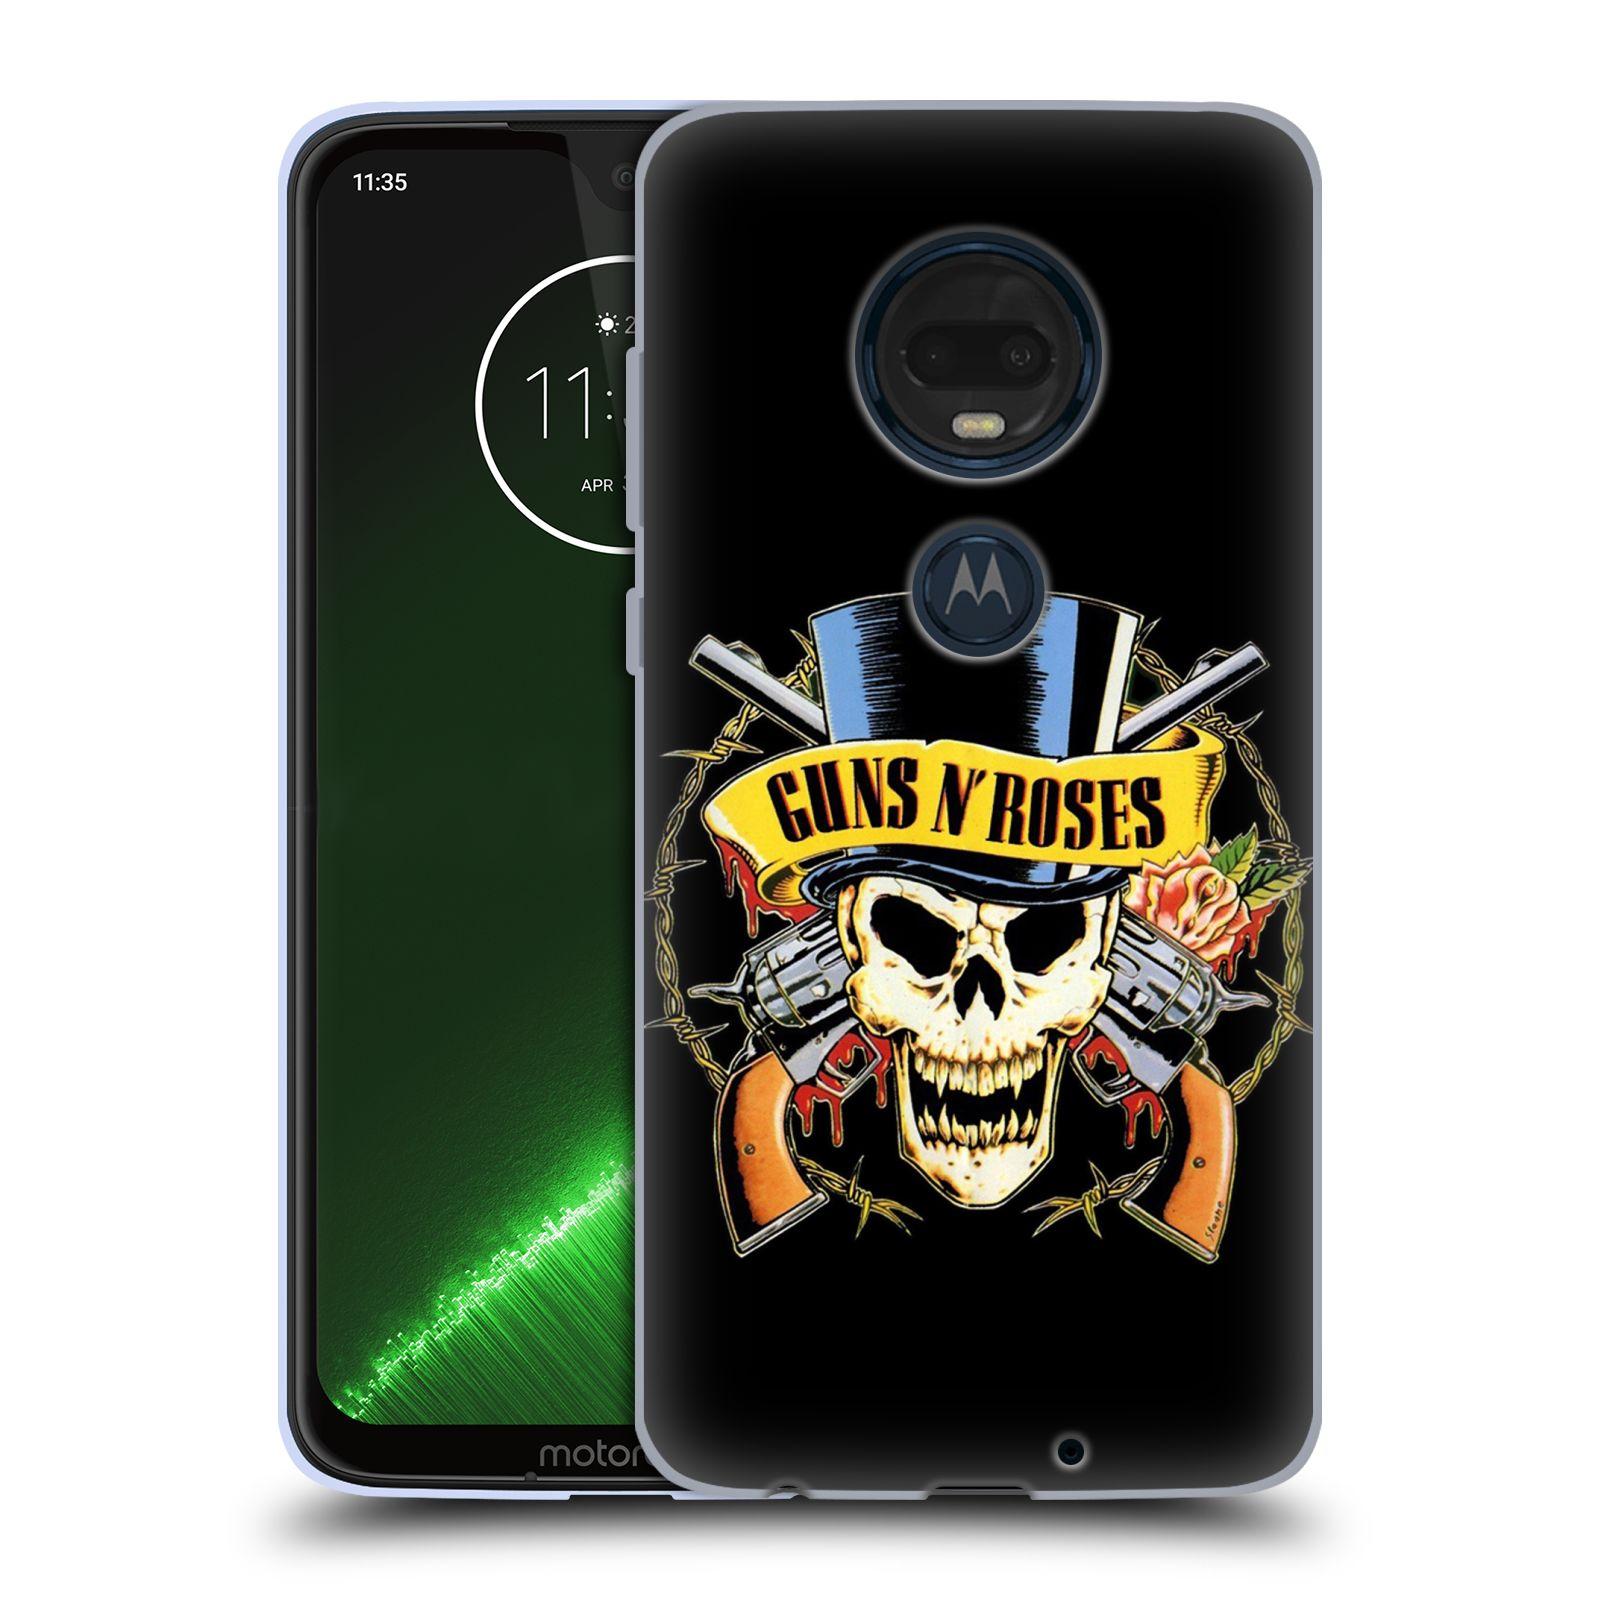 Silikonové pouzdro na mobil Motorola Moto G7 Plus - Head Case - Guns N' Roses - Lebka